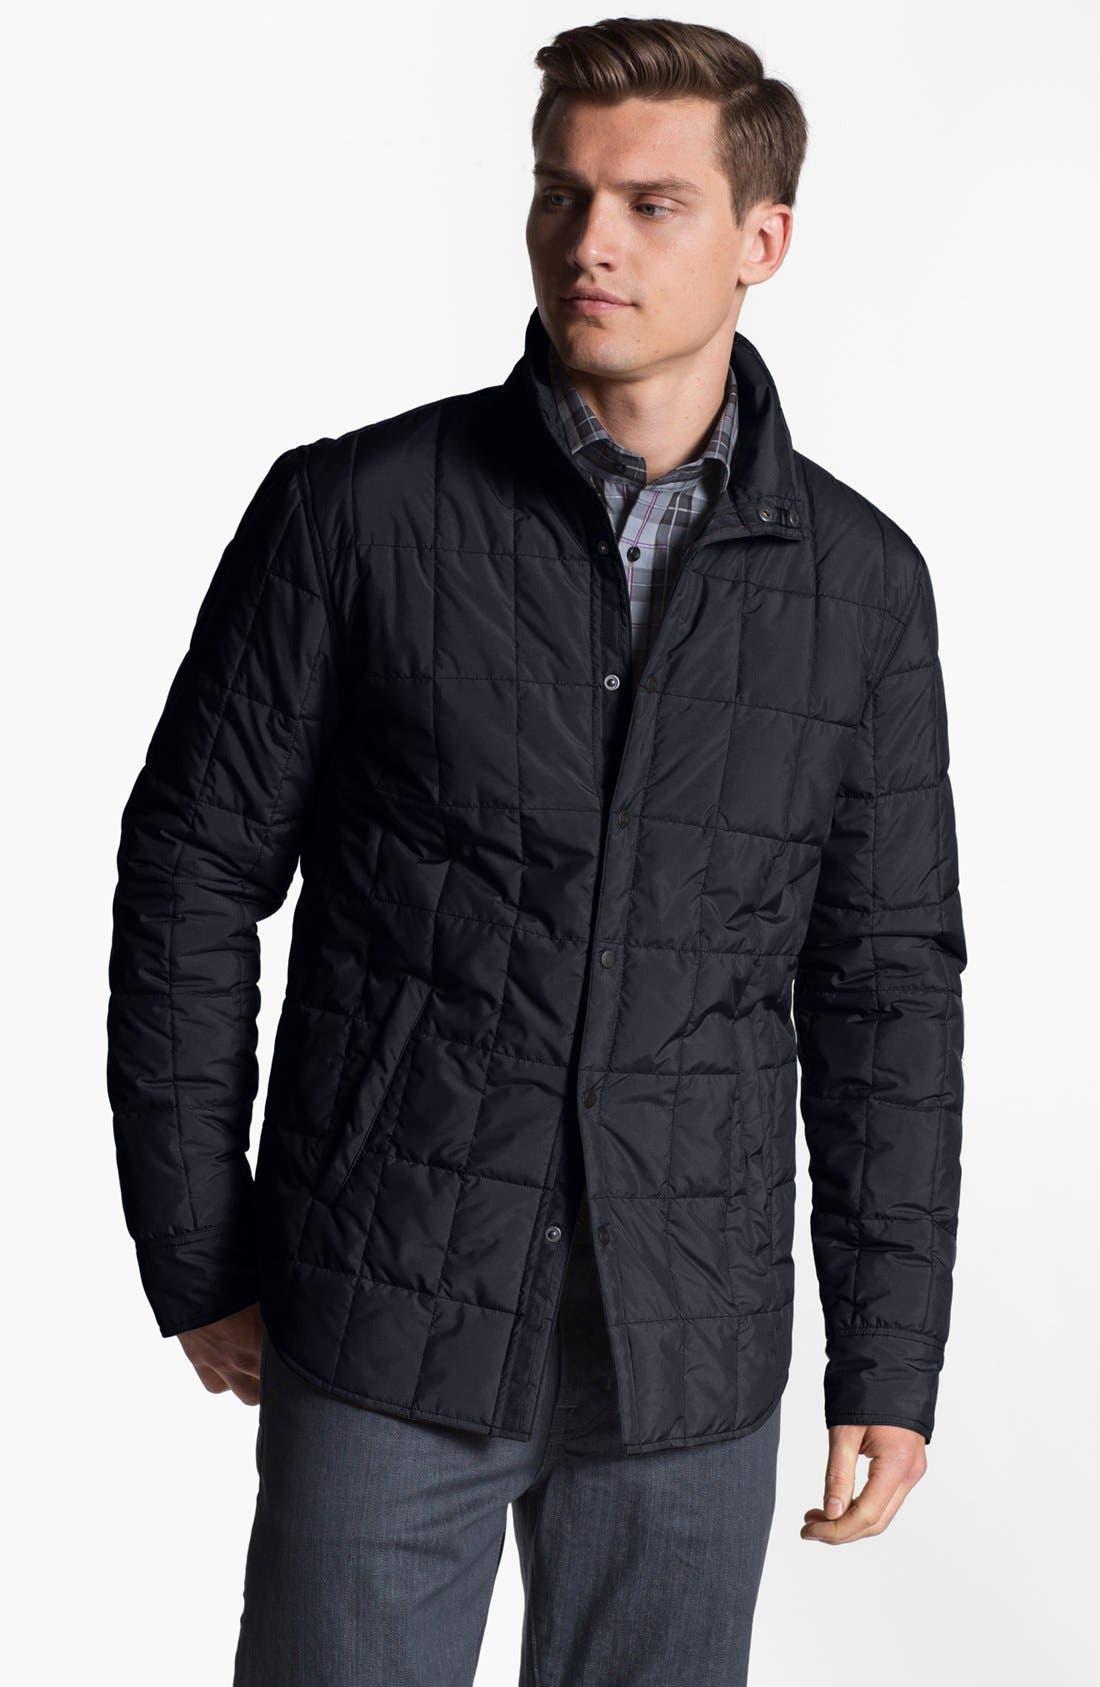 Alternate Image 1 Selected - Victorinox Swiss Army® 'Utility' Shirt Jacket